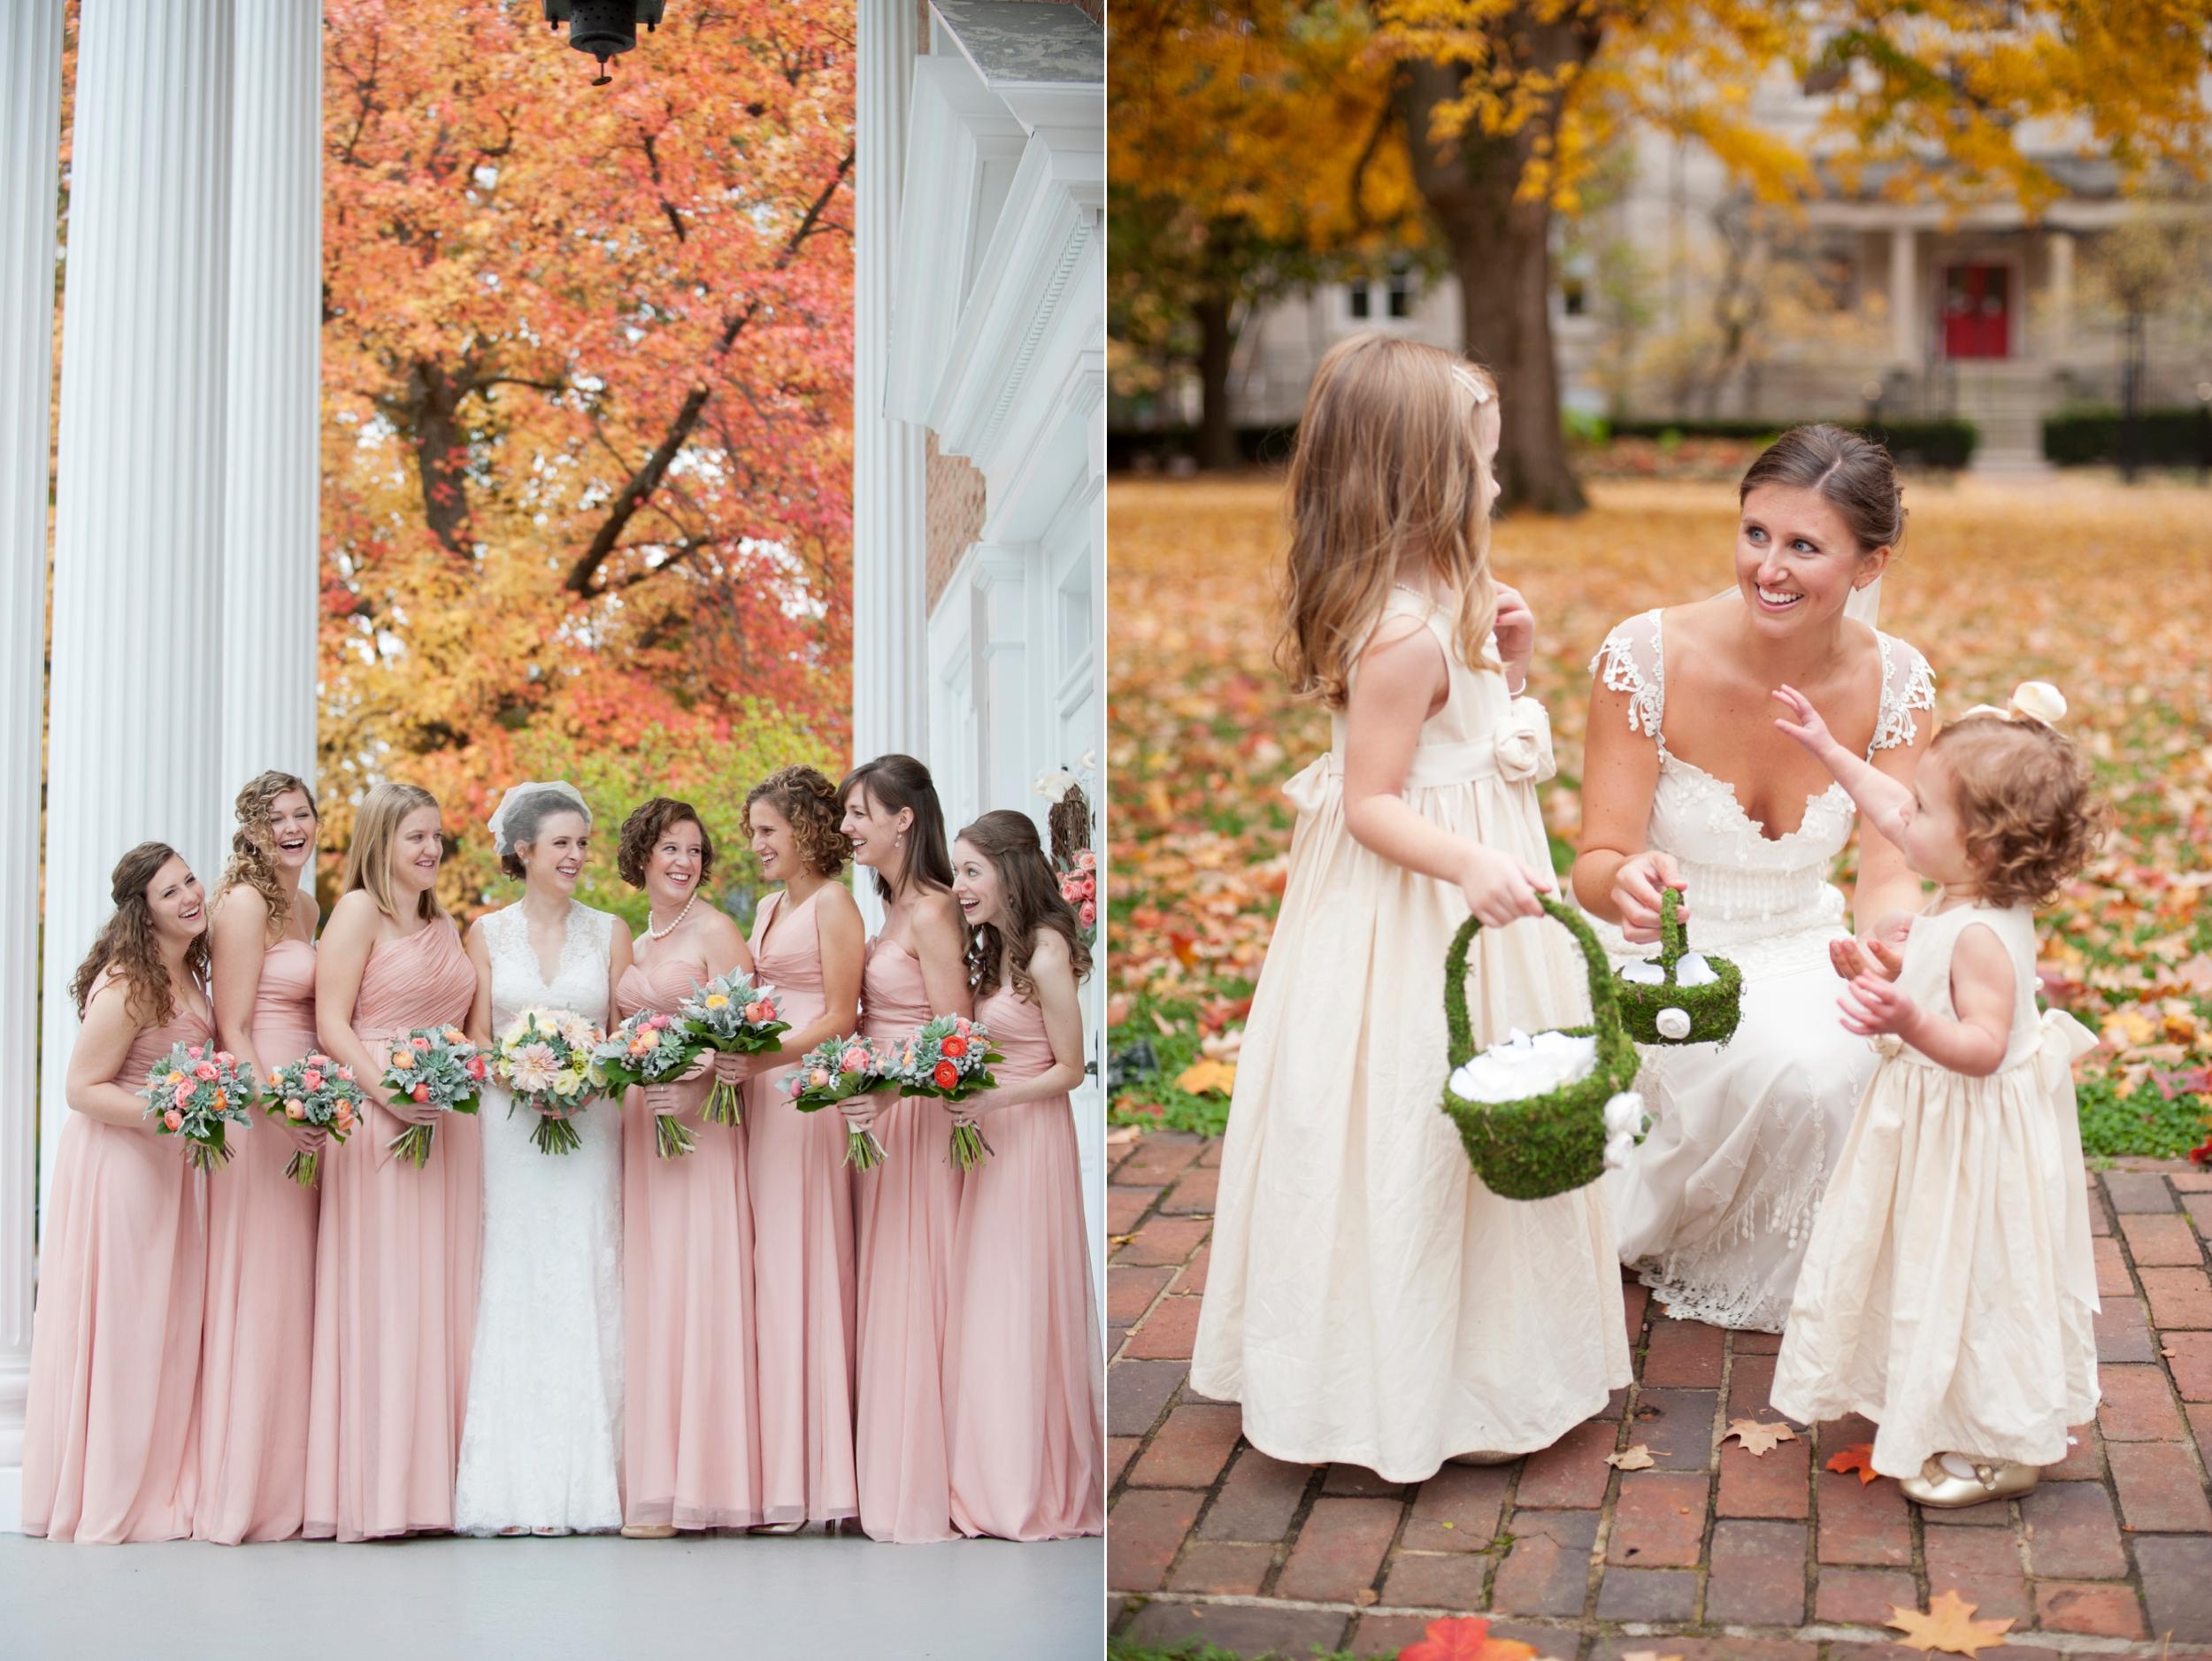 26-fall-blush-pink-wedding-gowns.JPG